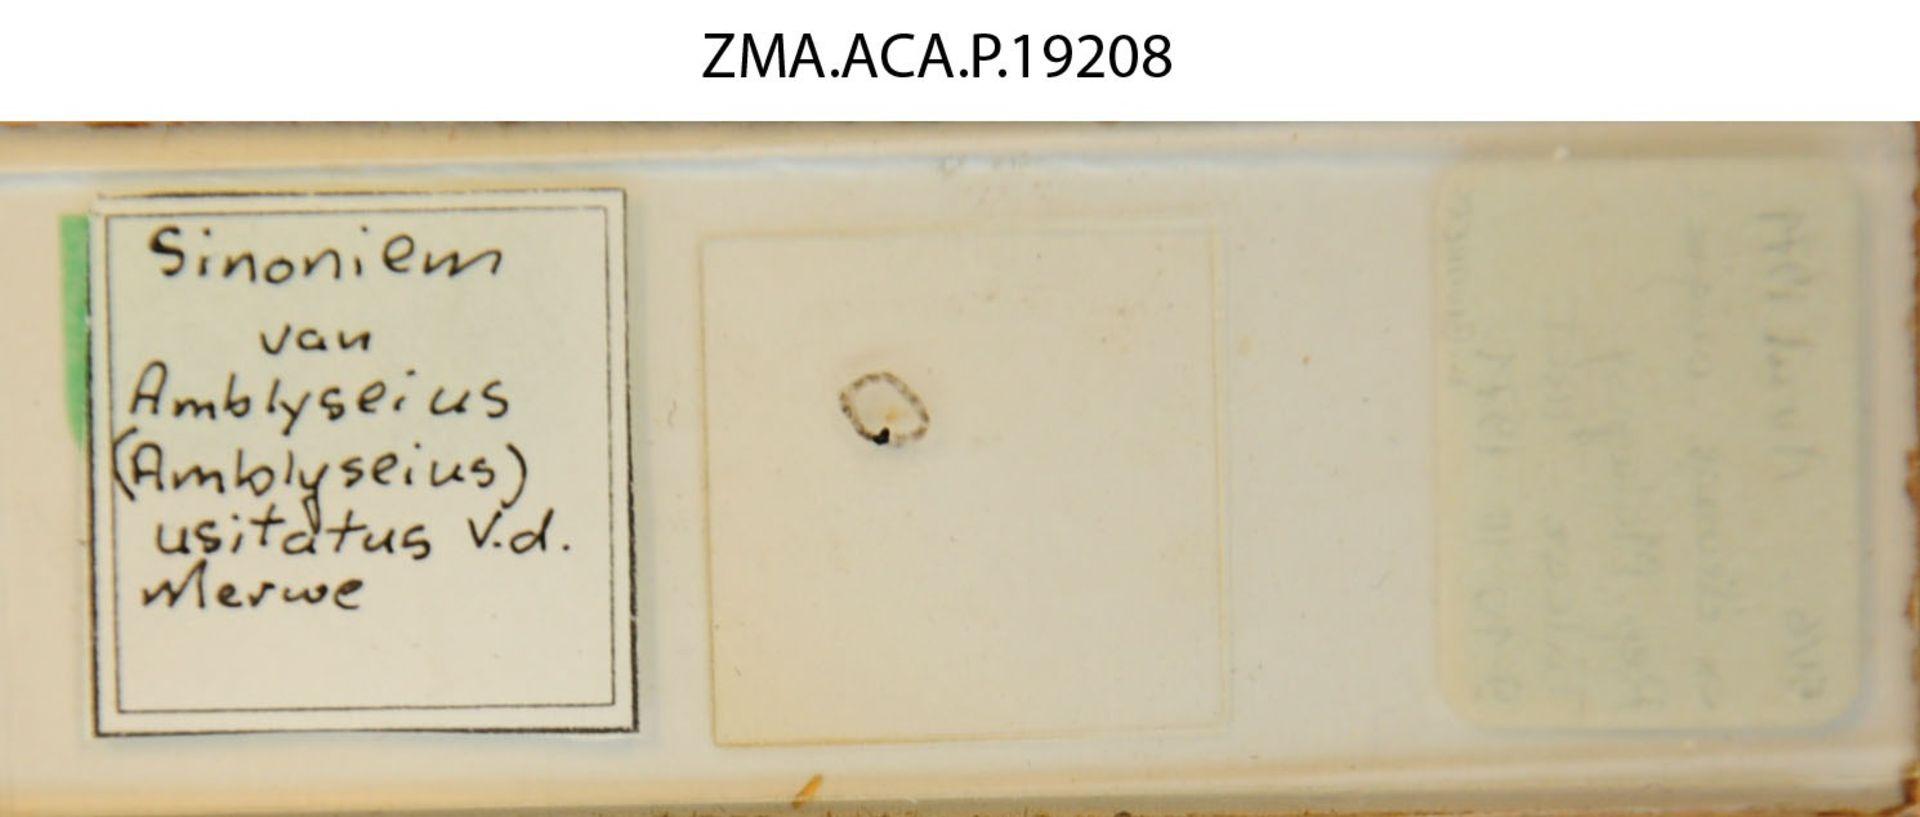 ZMA.ACA.P.19208 | Amblyseius (Amblyseius) masiaka Blommers & Chazeau, 1974